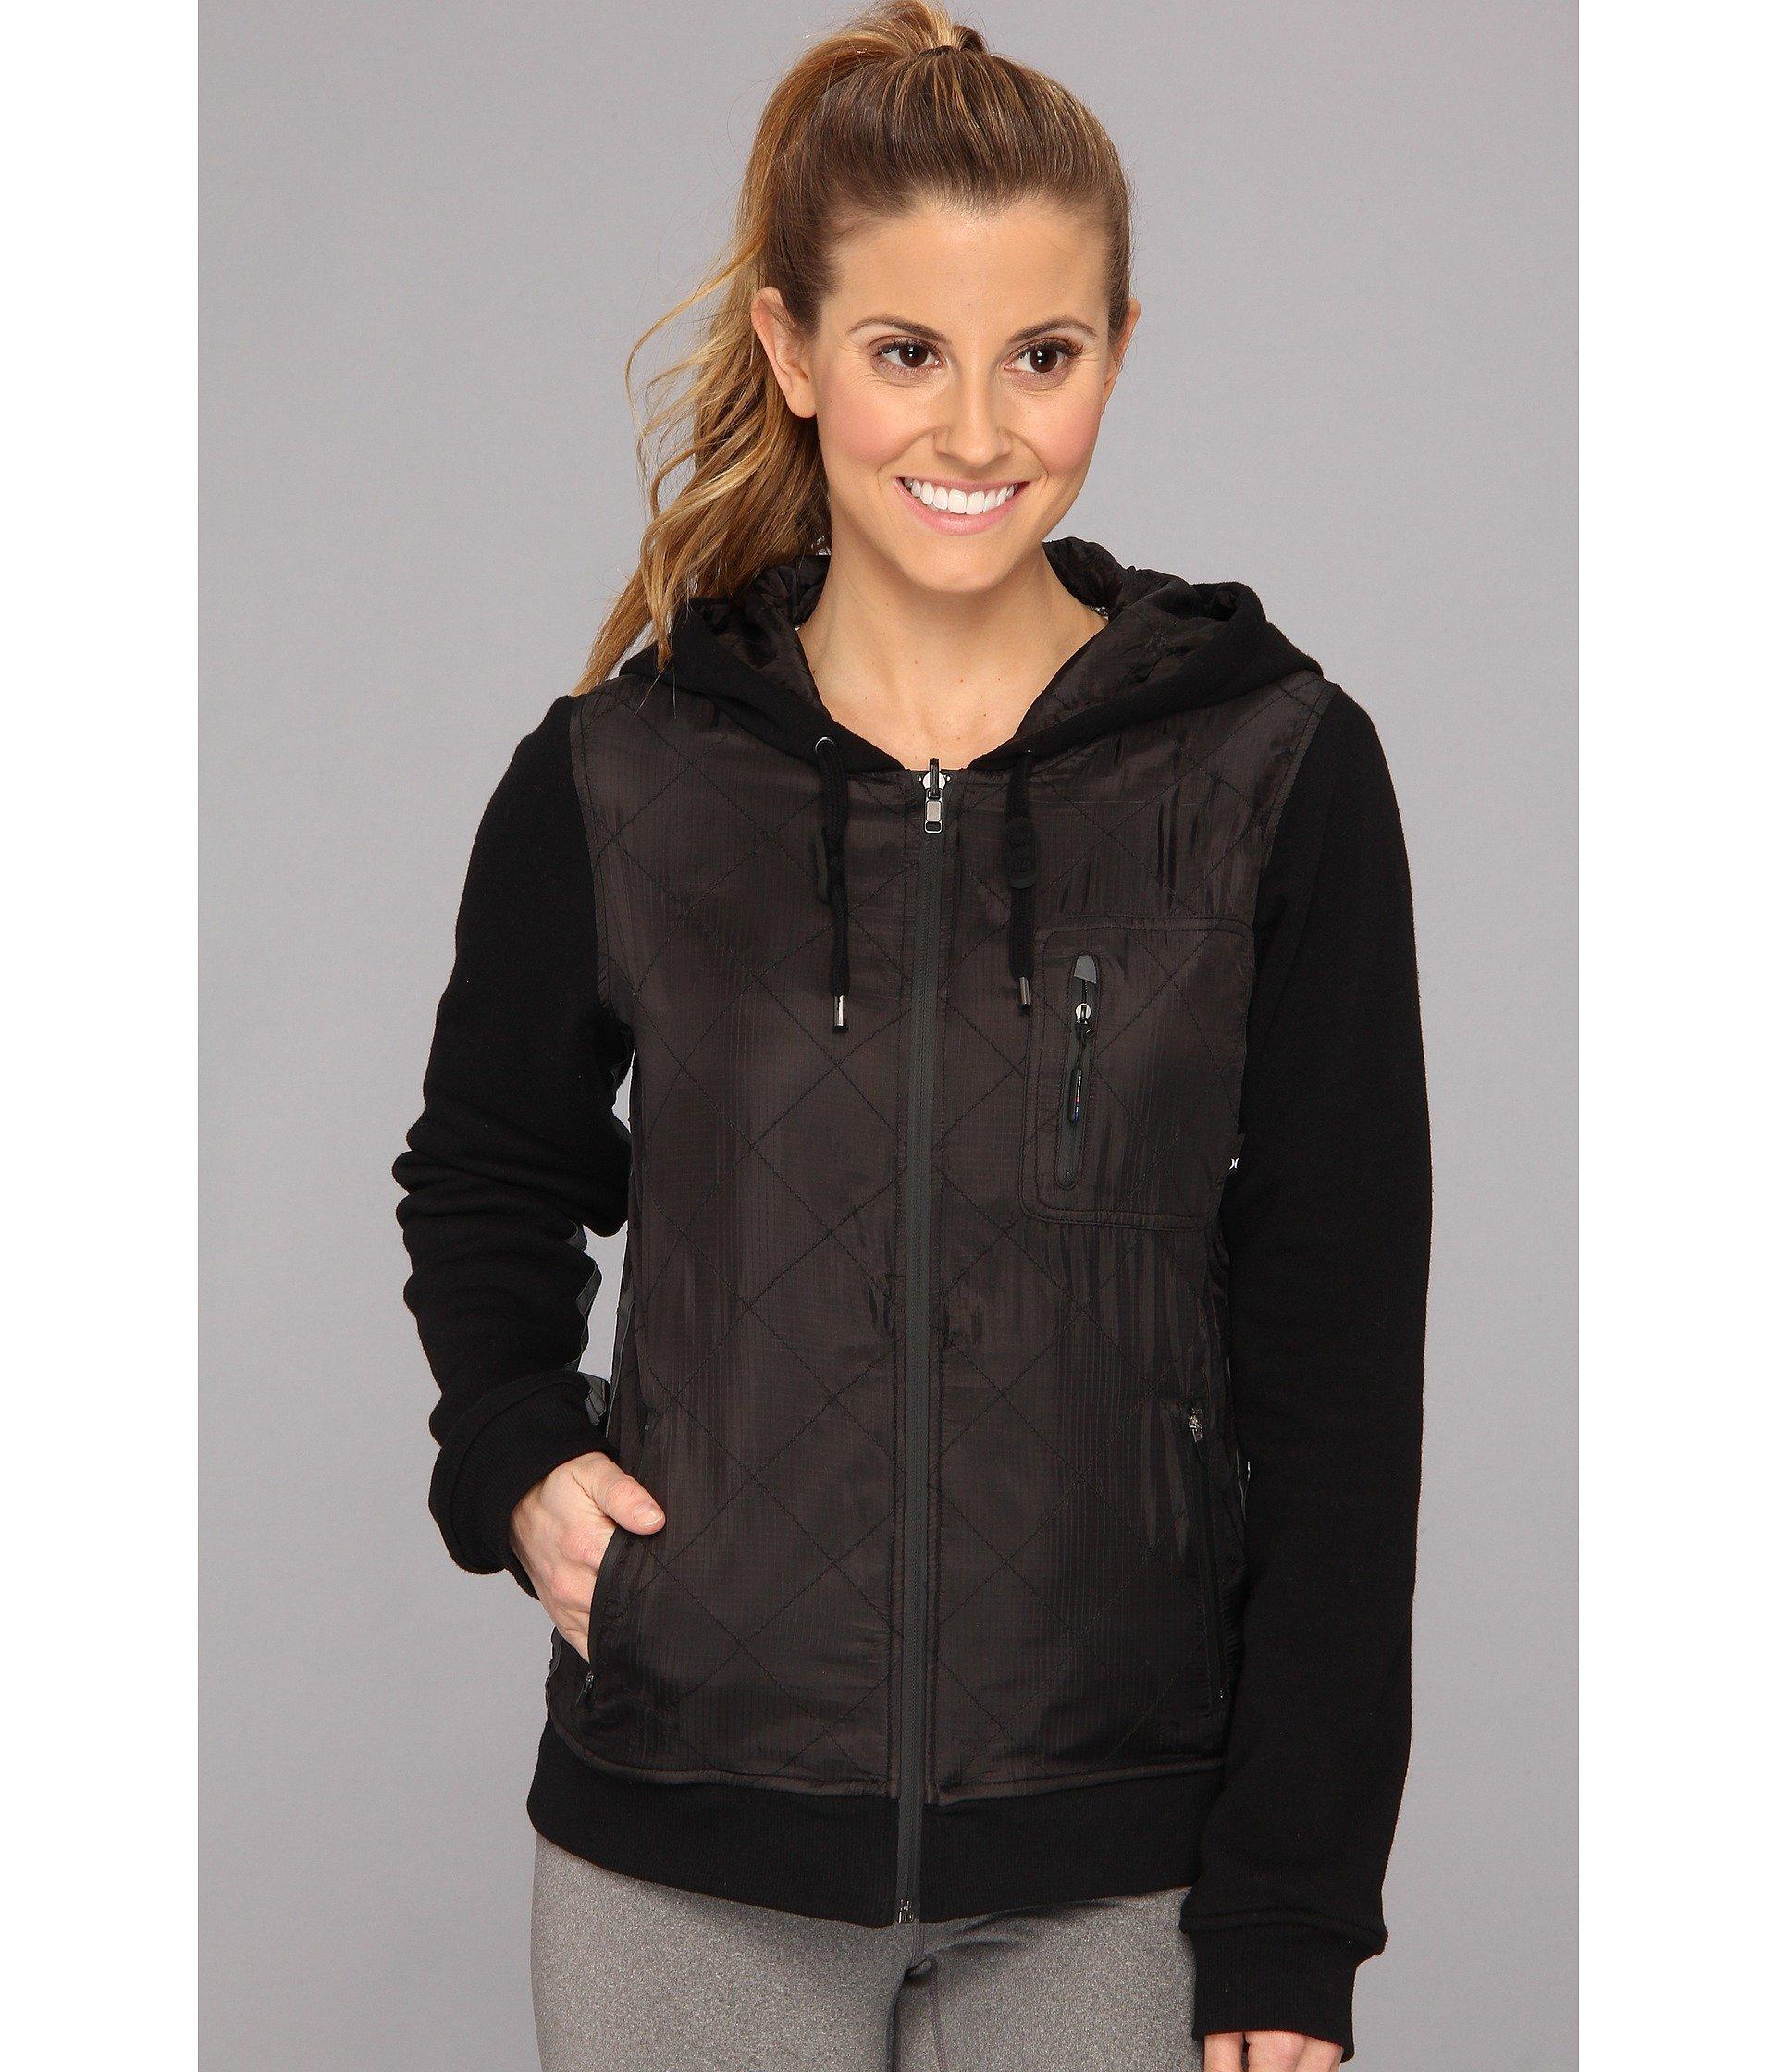 Hurley Women's Parachute Pack Culprit Jacket Black Outerwear XS (US 00-1) by Hurley